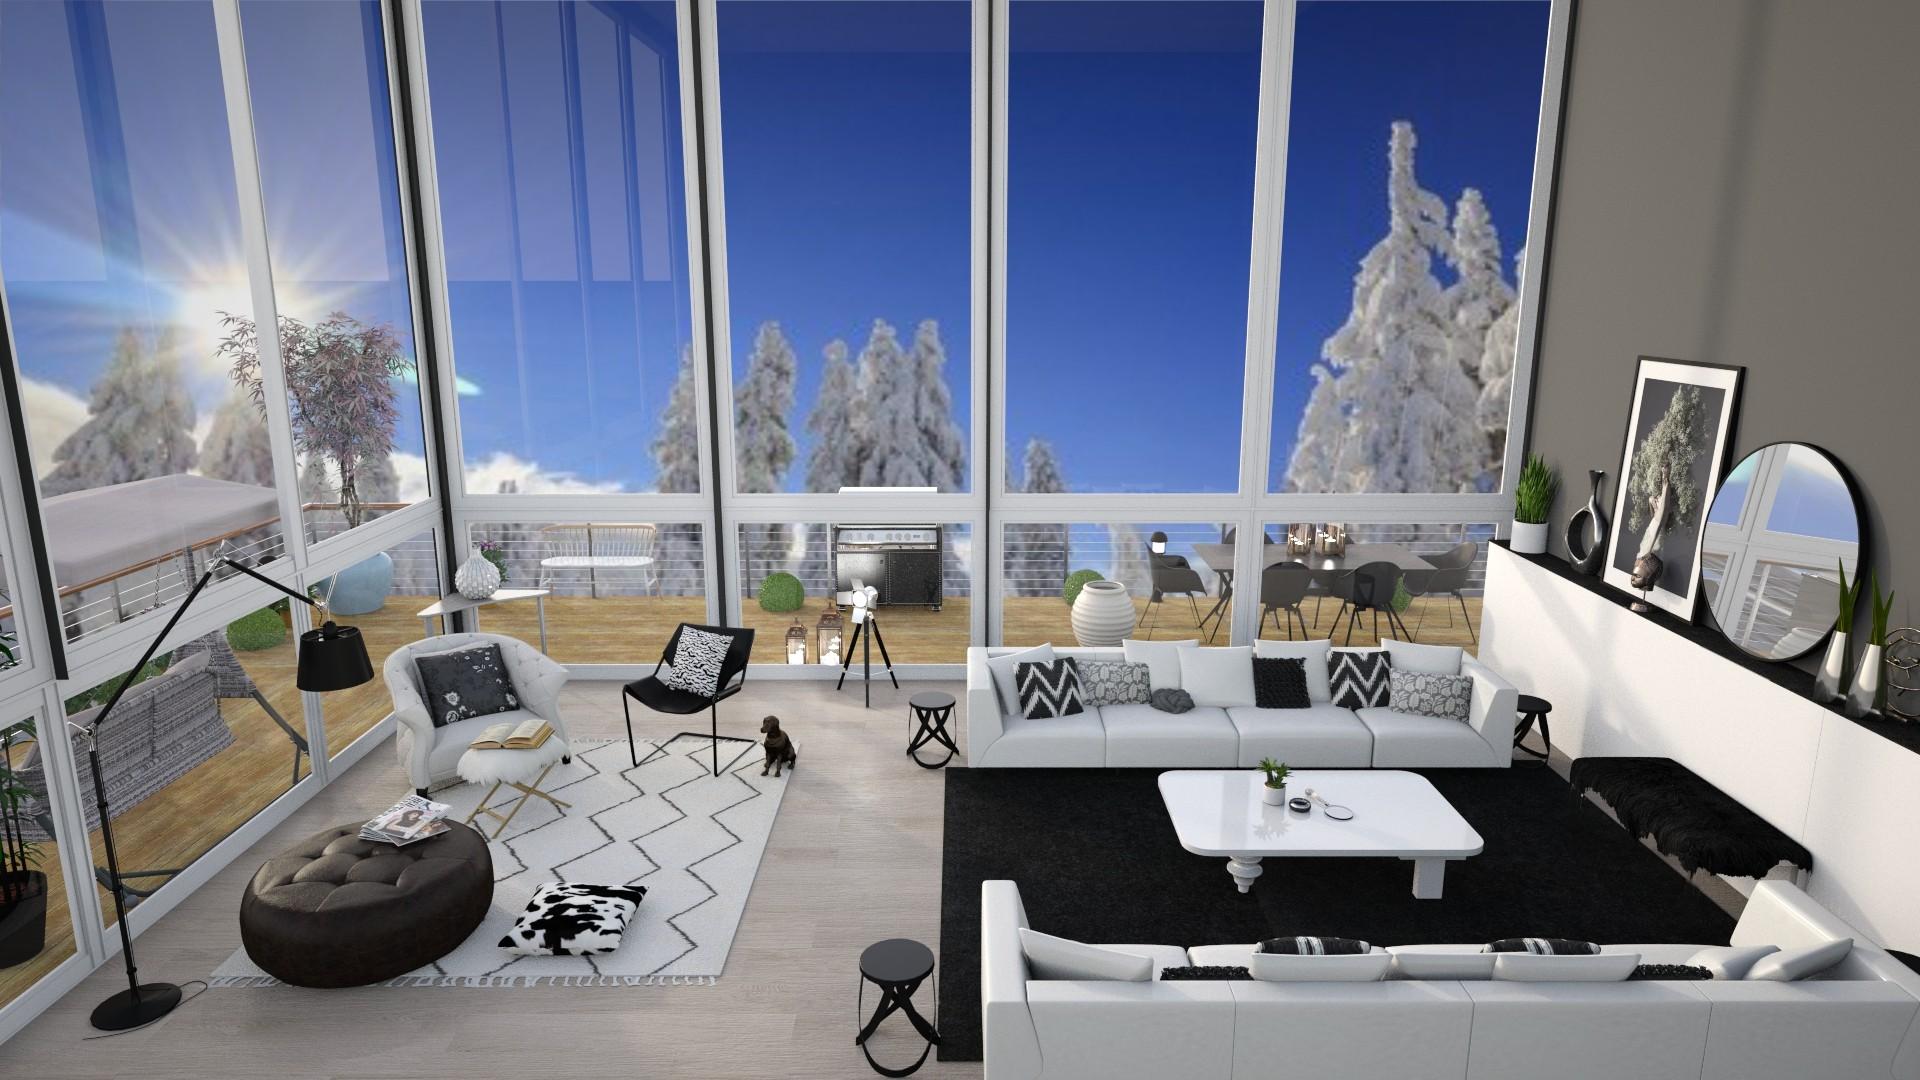 living room - by harleenbhatia12